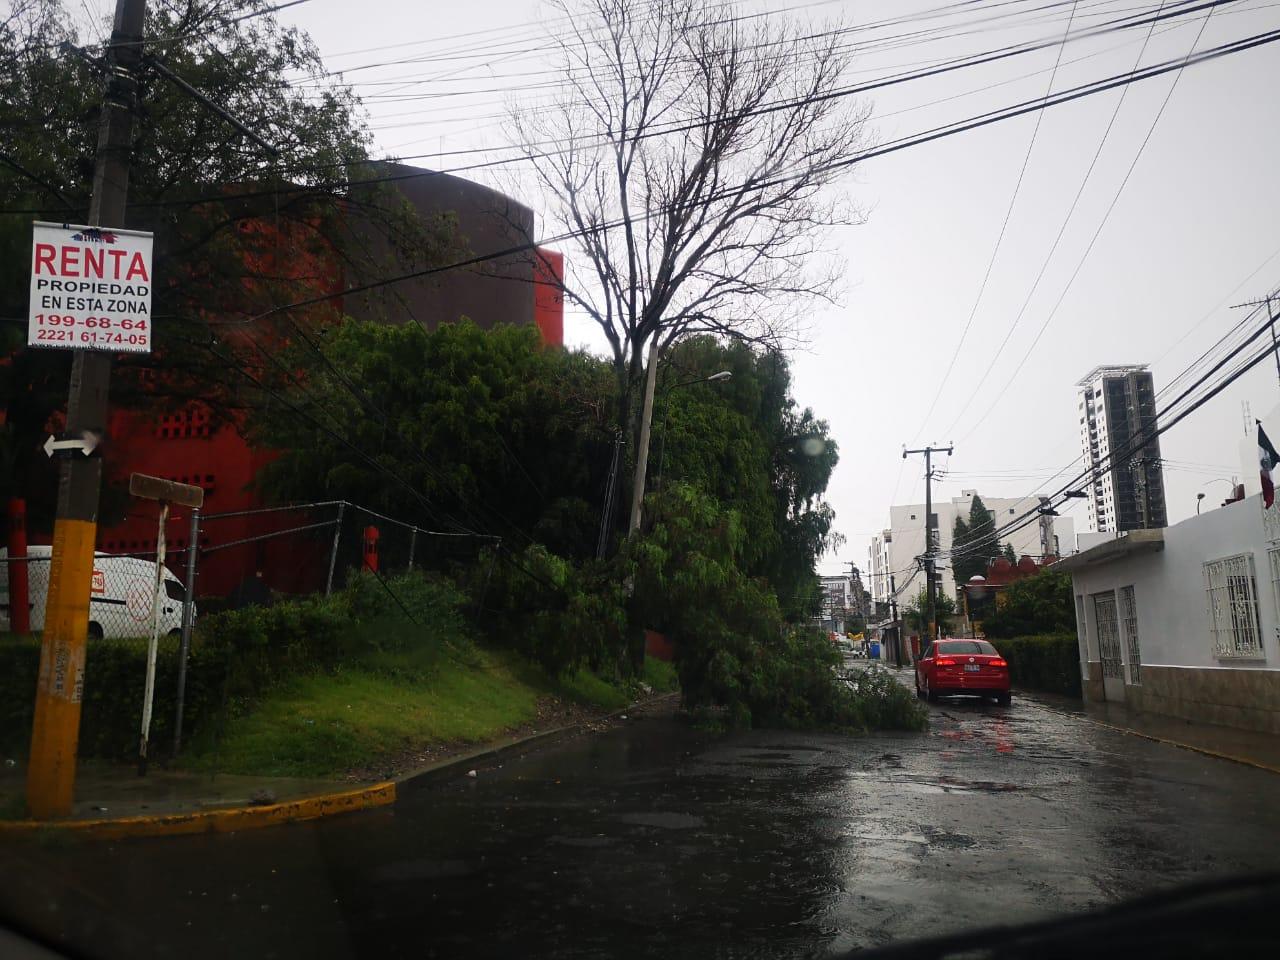 Tromba derrumba 2 árboles en la capital